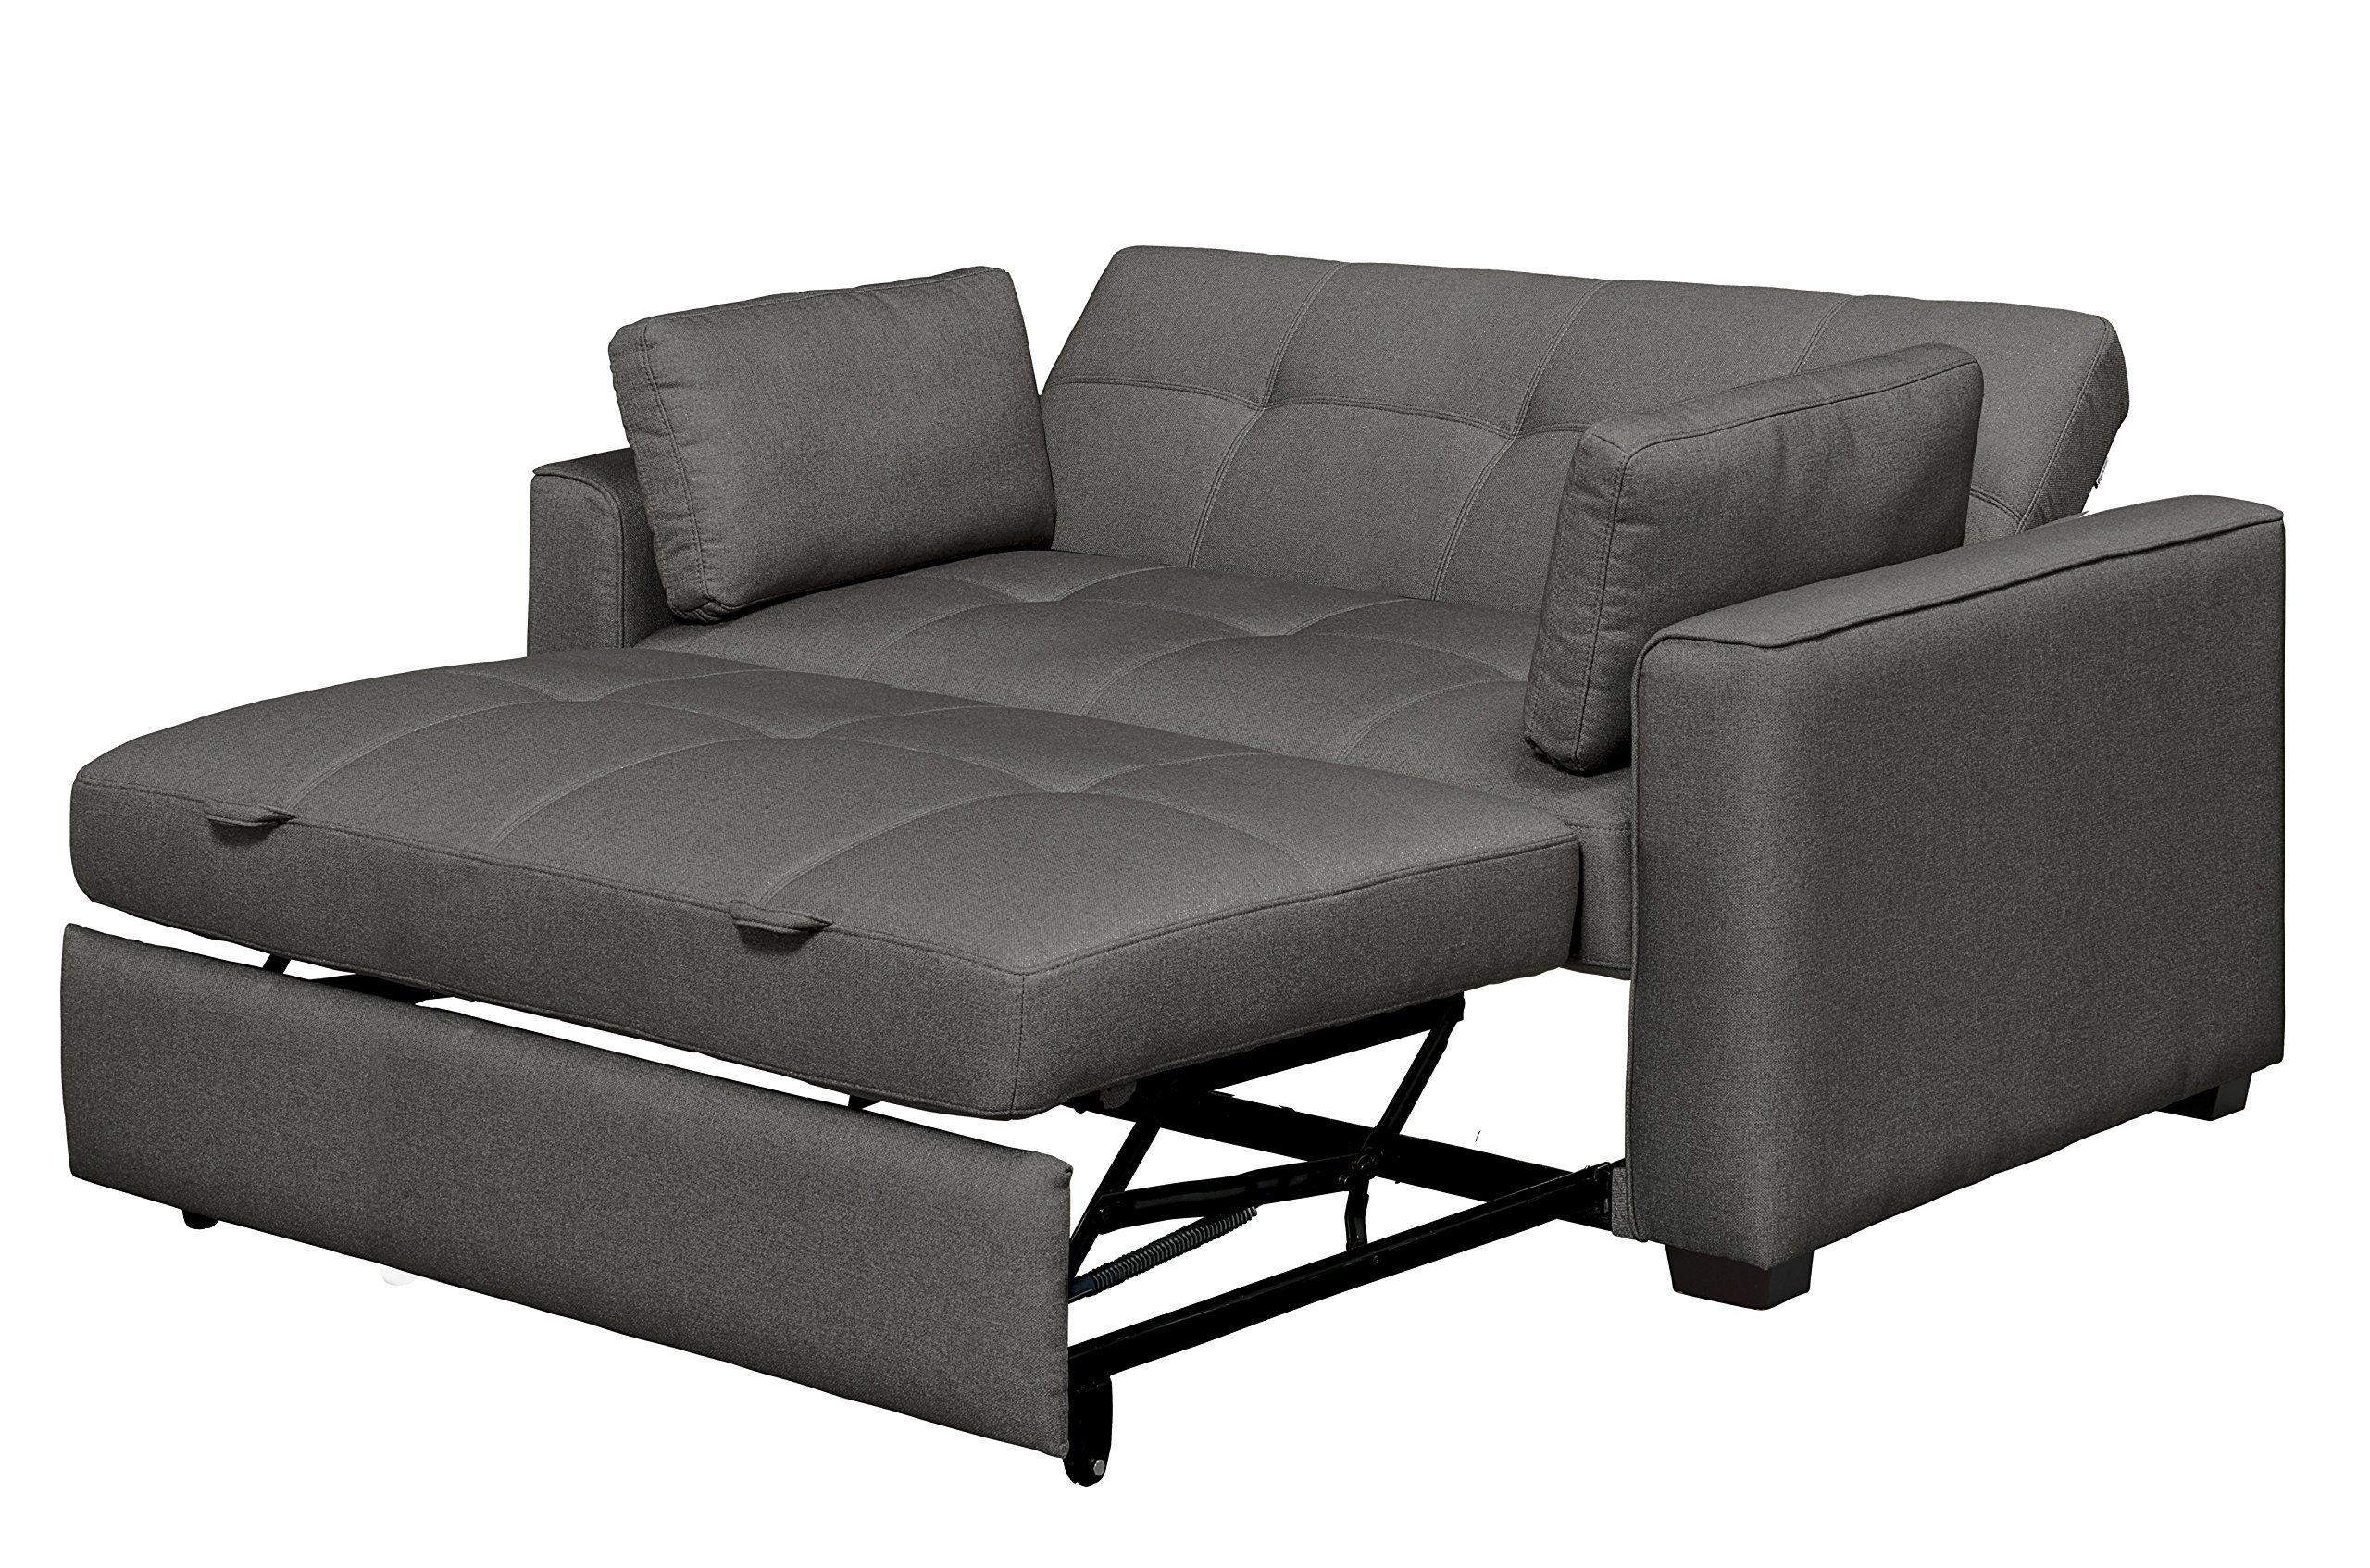 Mechali Products Furniture Serta Sofa Sleeper Convertible Into Lounger Love Seat Bed Twin Fu Sectional Sofa With Recliner Convertible Sofa Bed Small Room Sofa #serta #living #room #sets